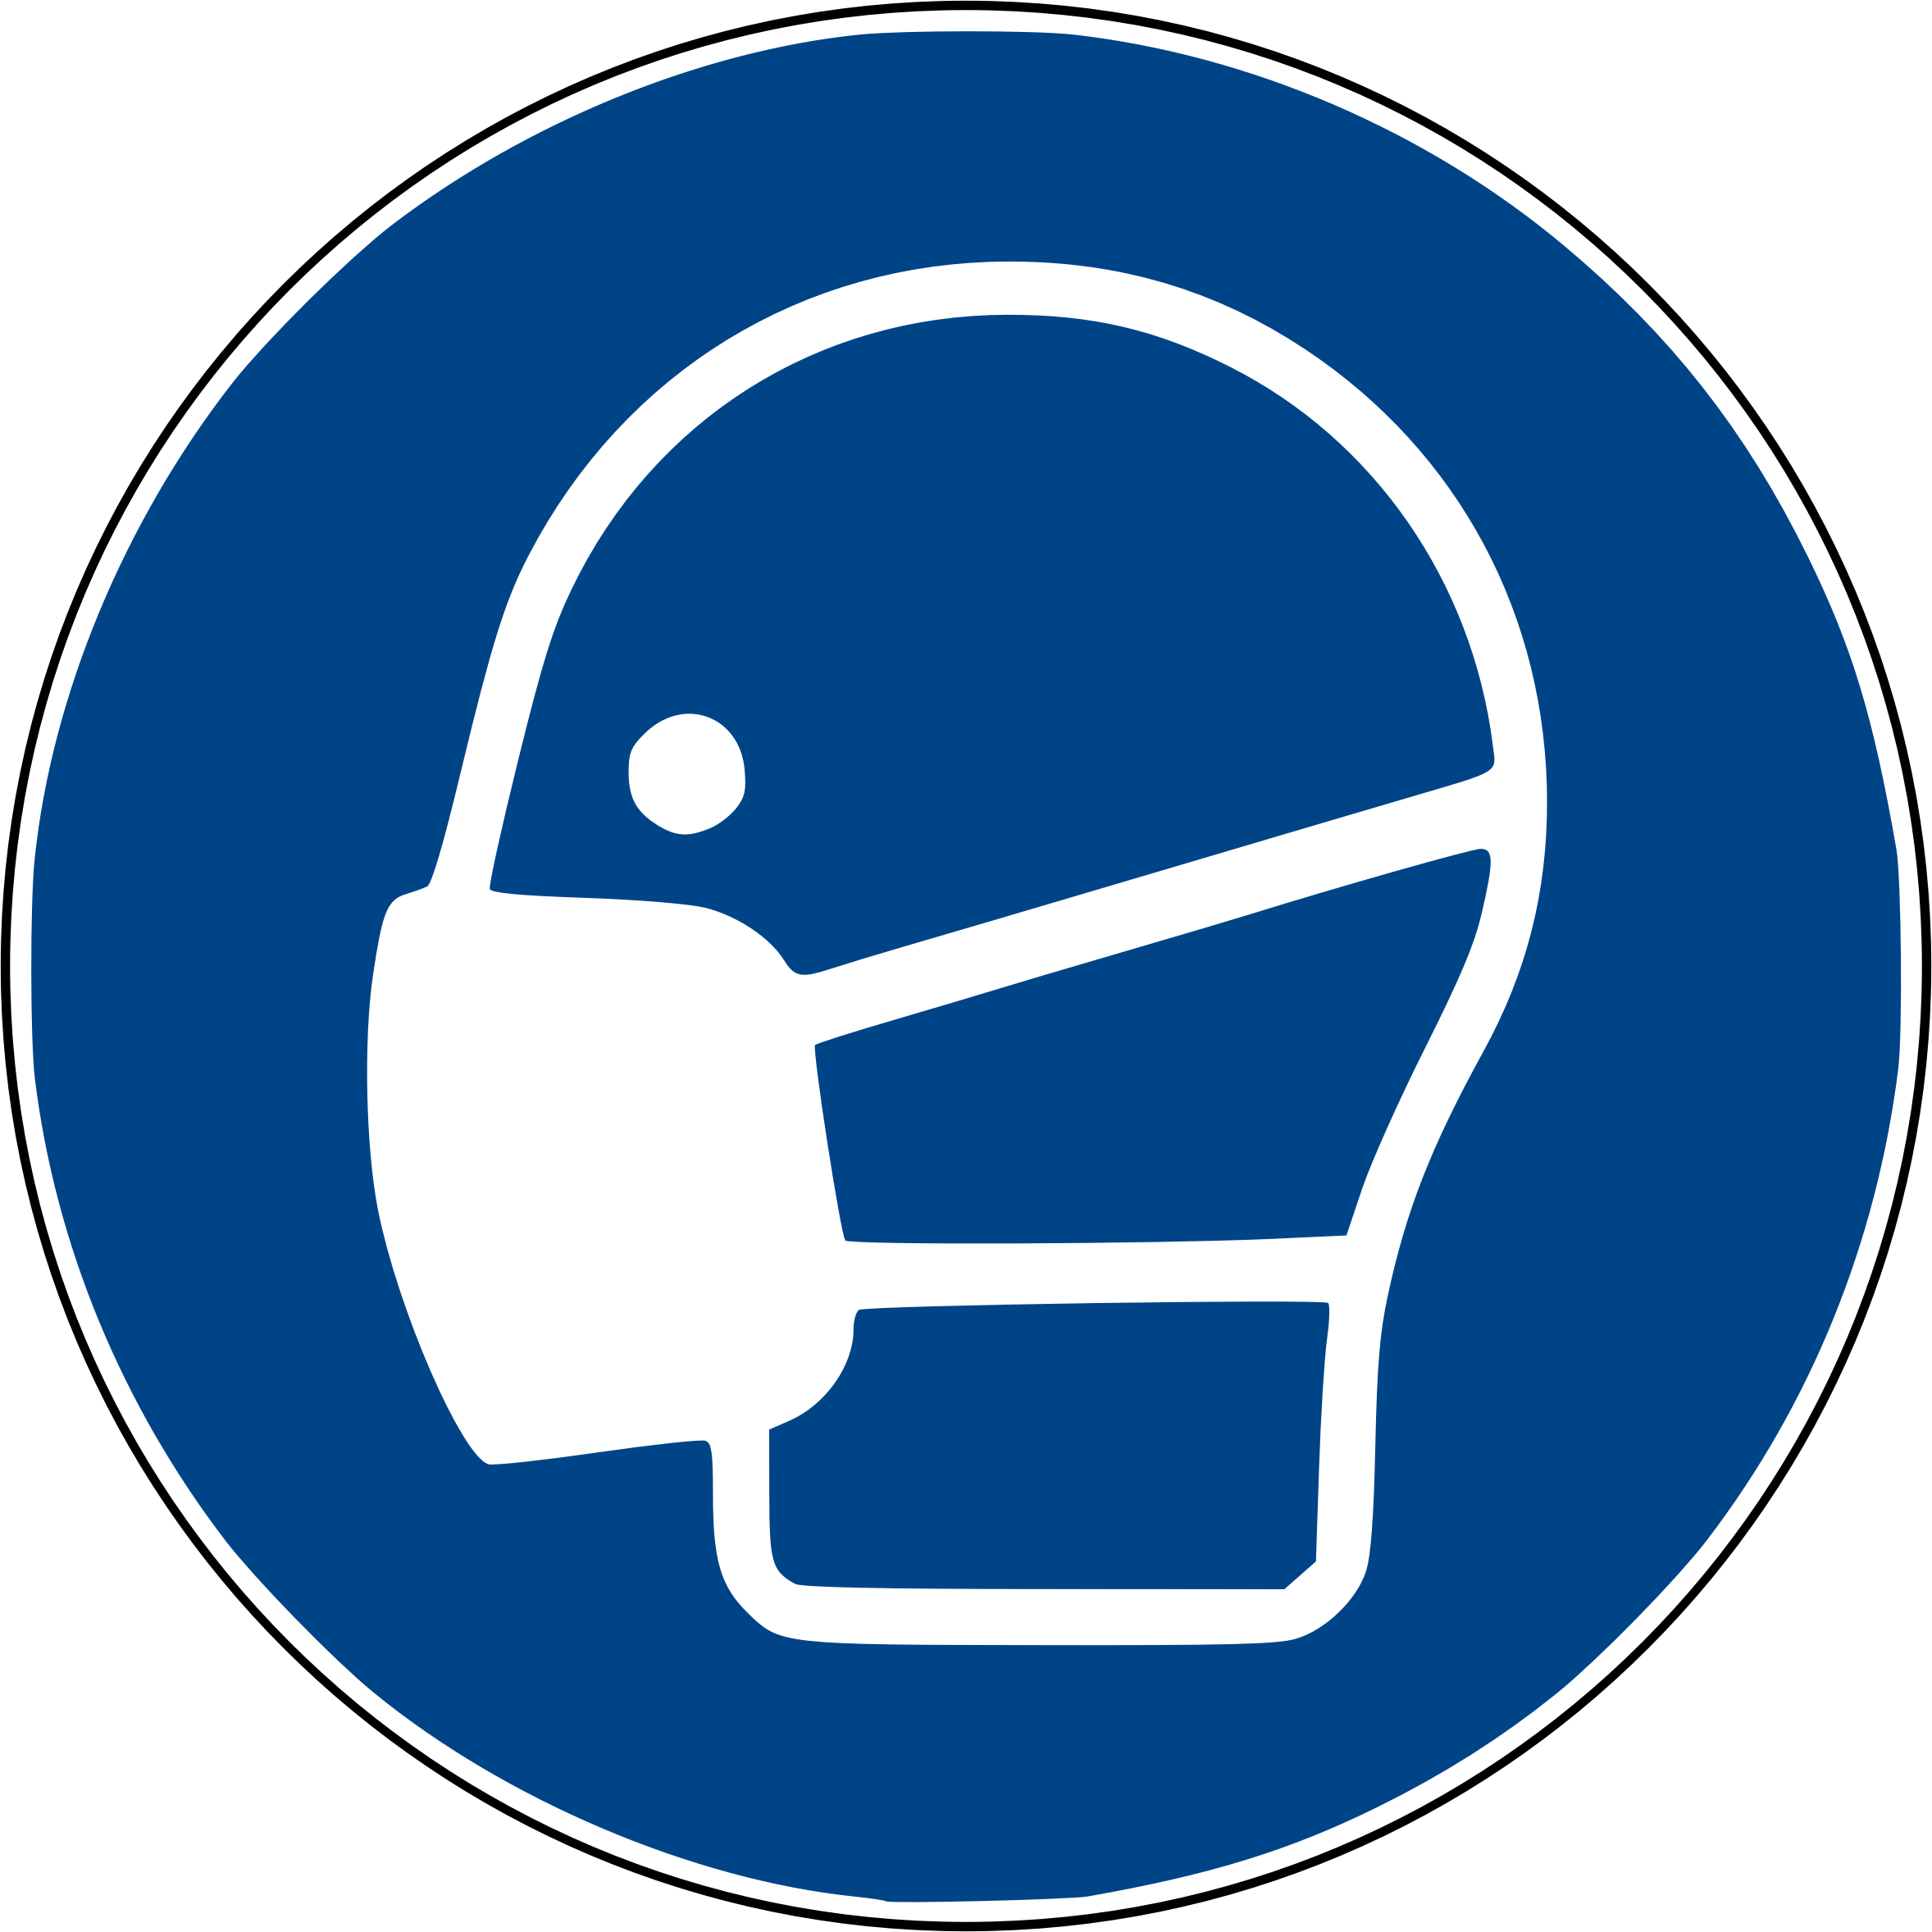 Clipart football face. Mask big image png